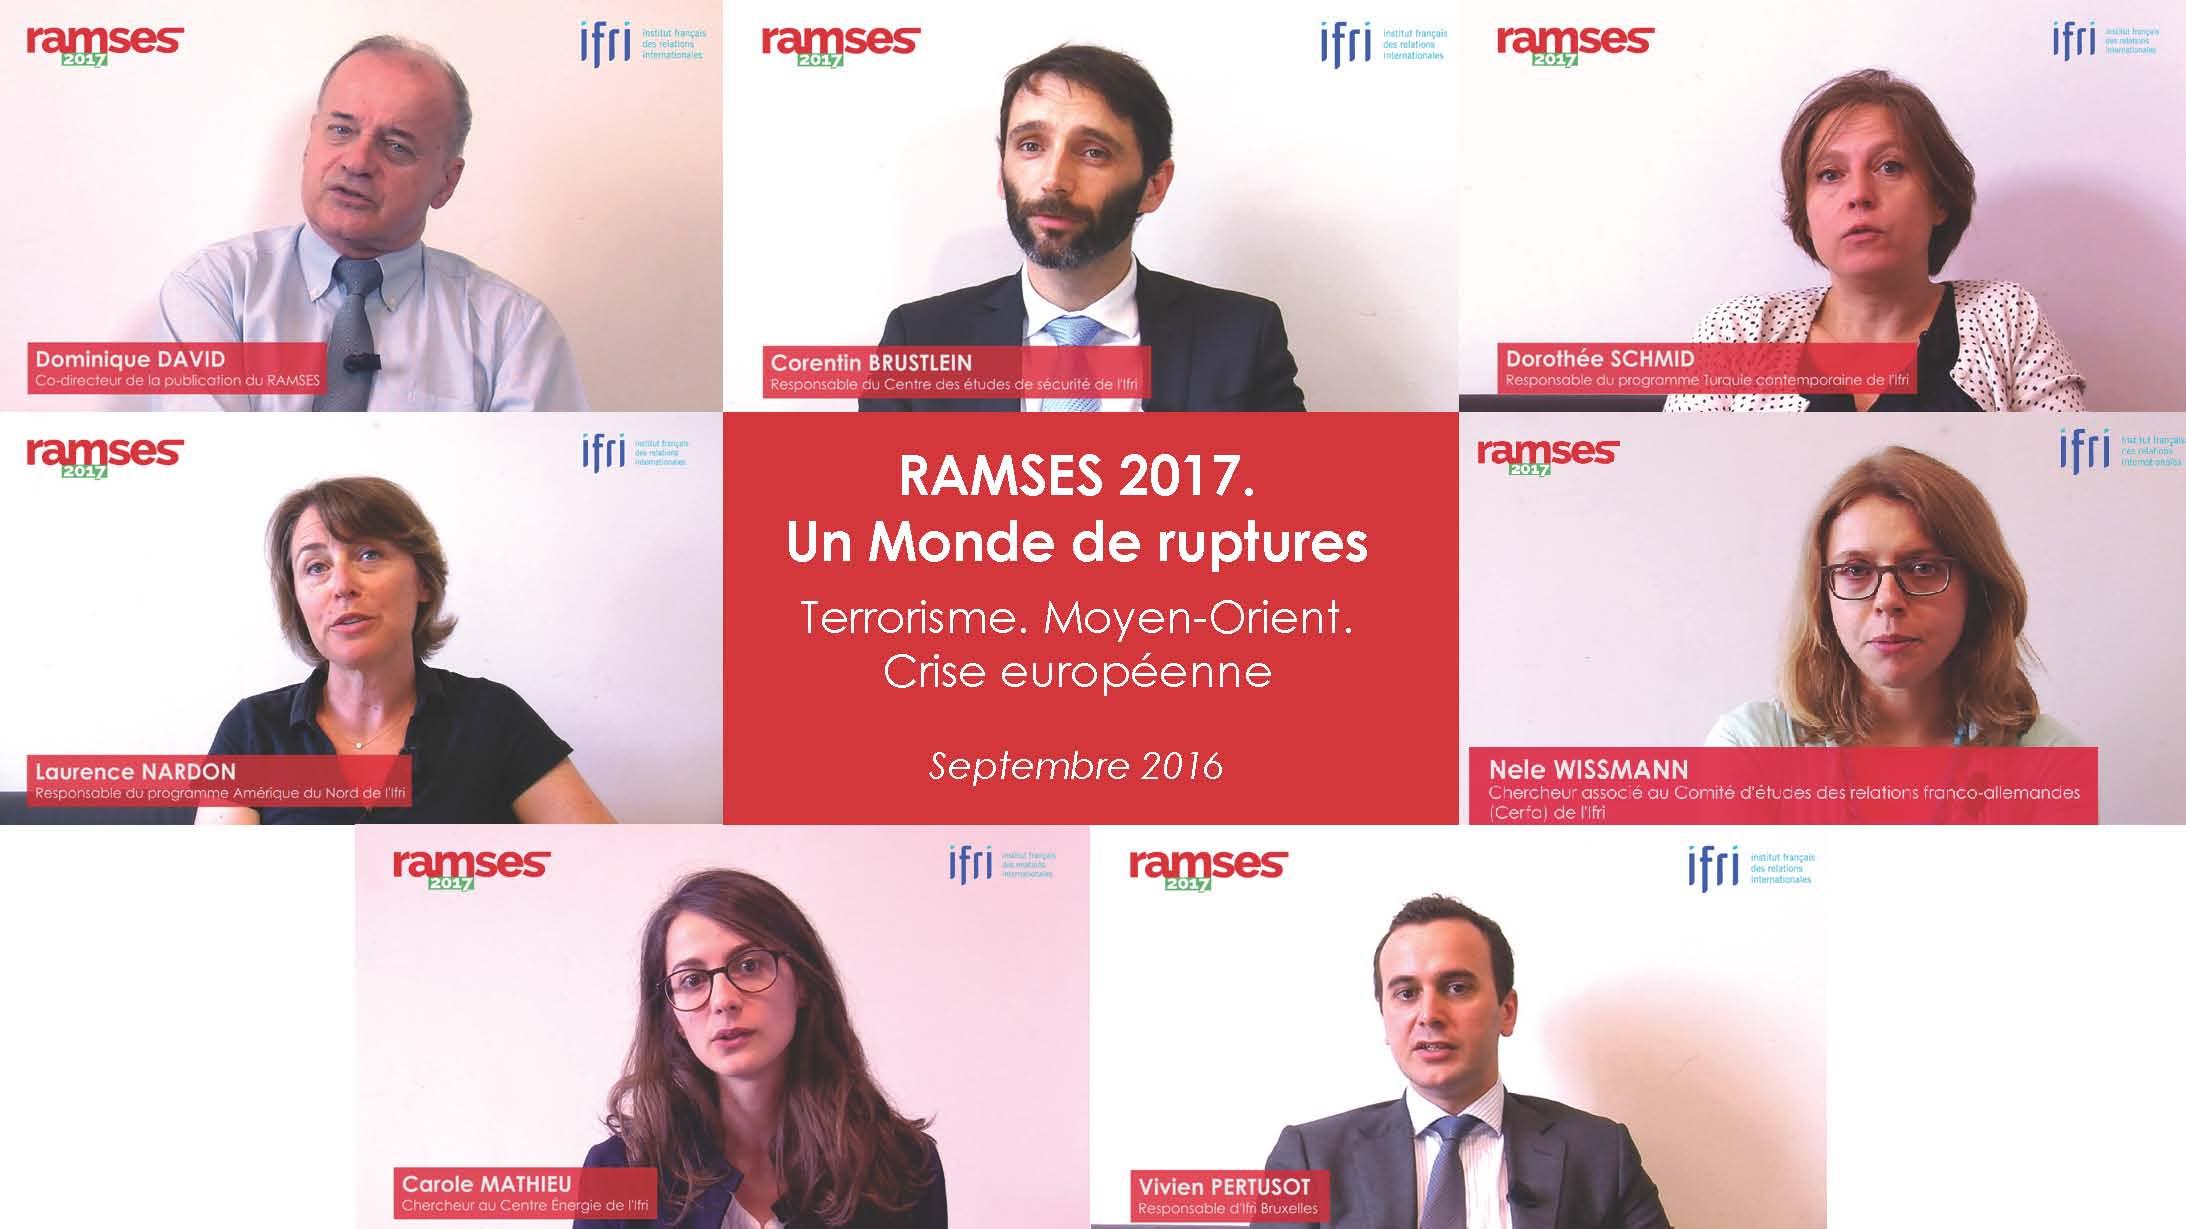 Les vidéos du RAMSES 2017